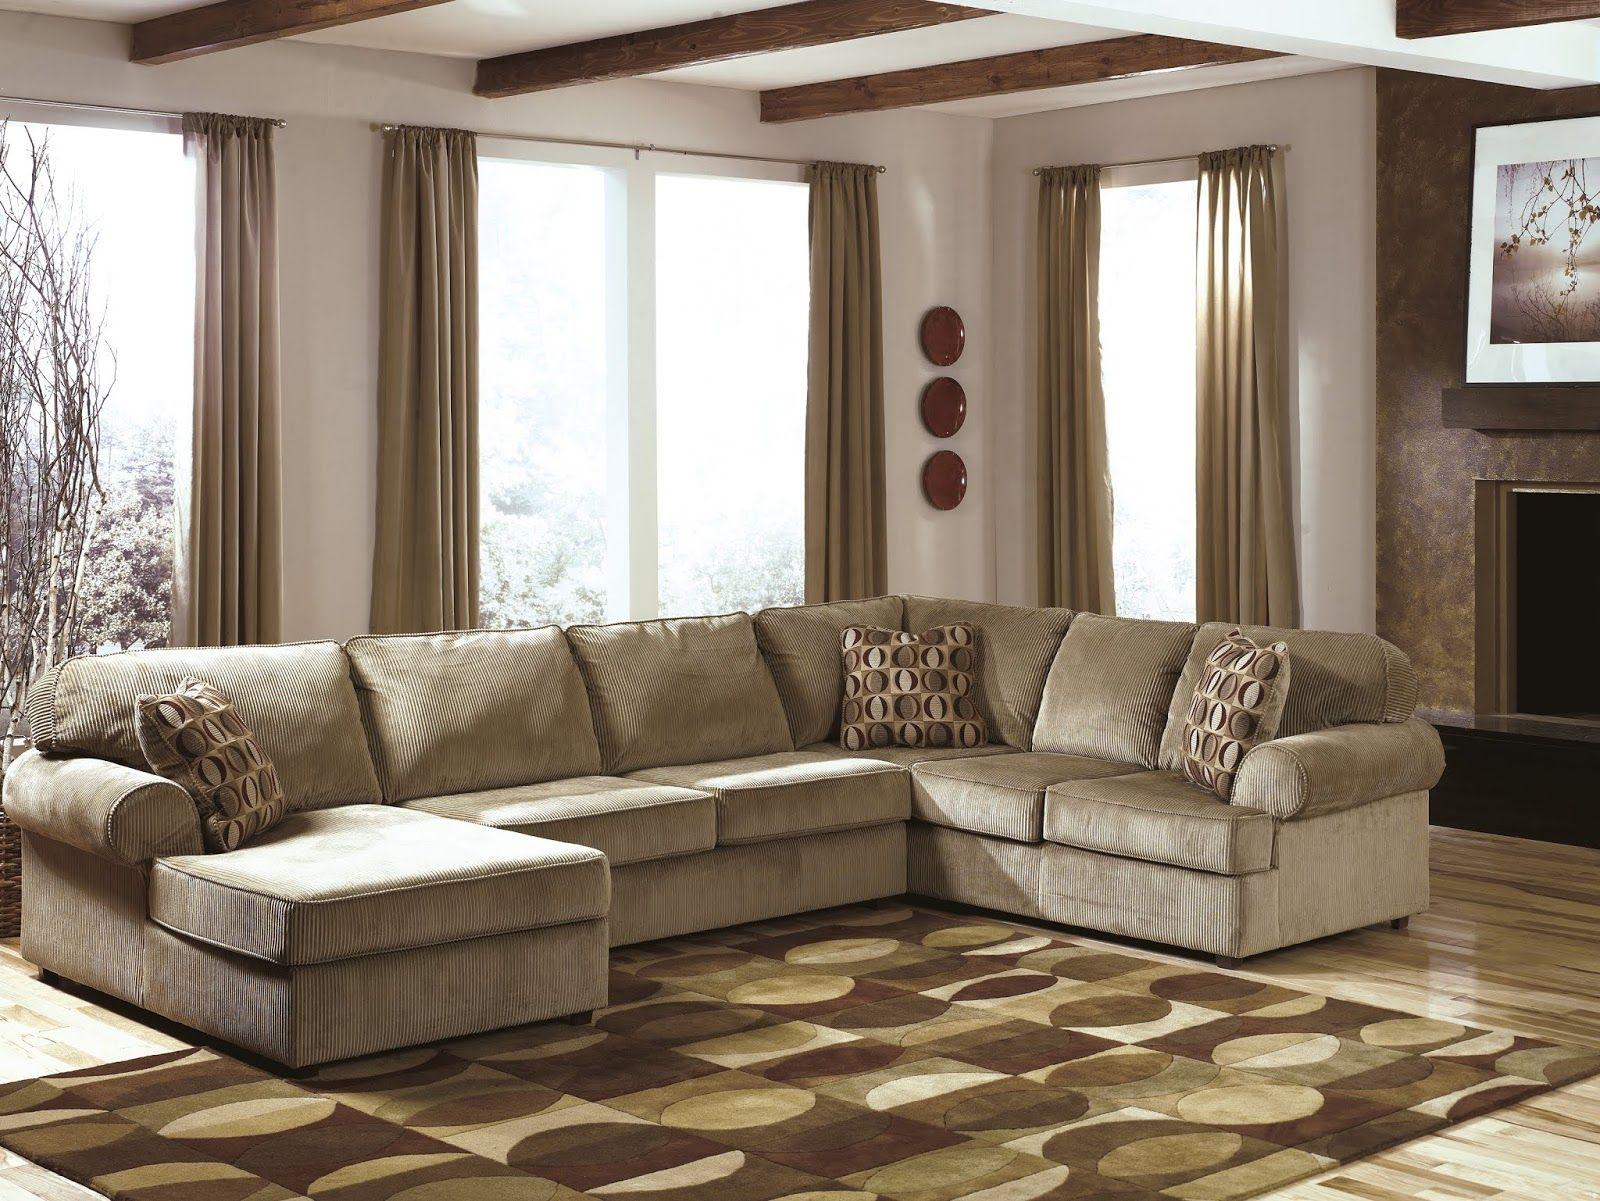 Best 16 Super Cheap Sofa Set You Must Check Sectional Sleeper 400 x 300